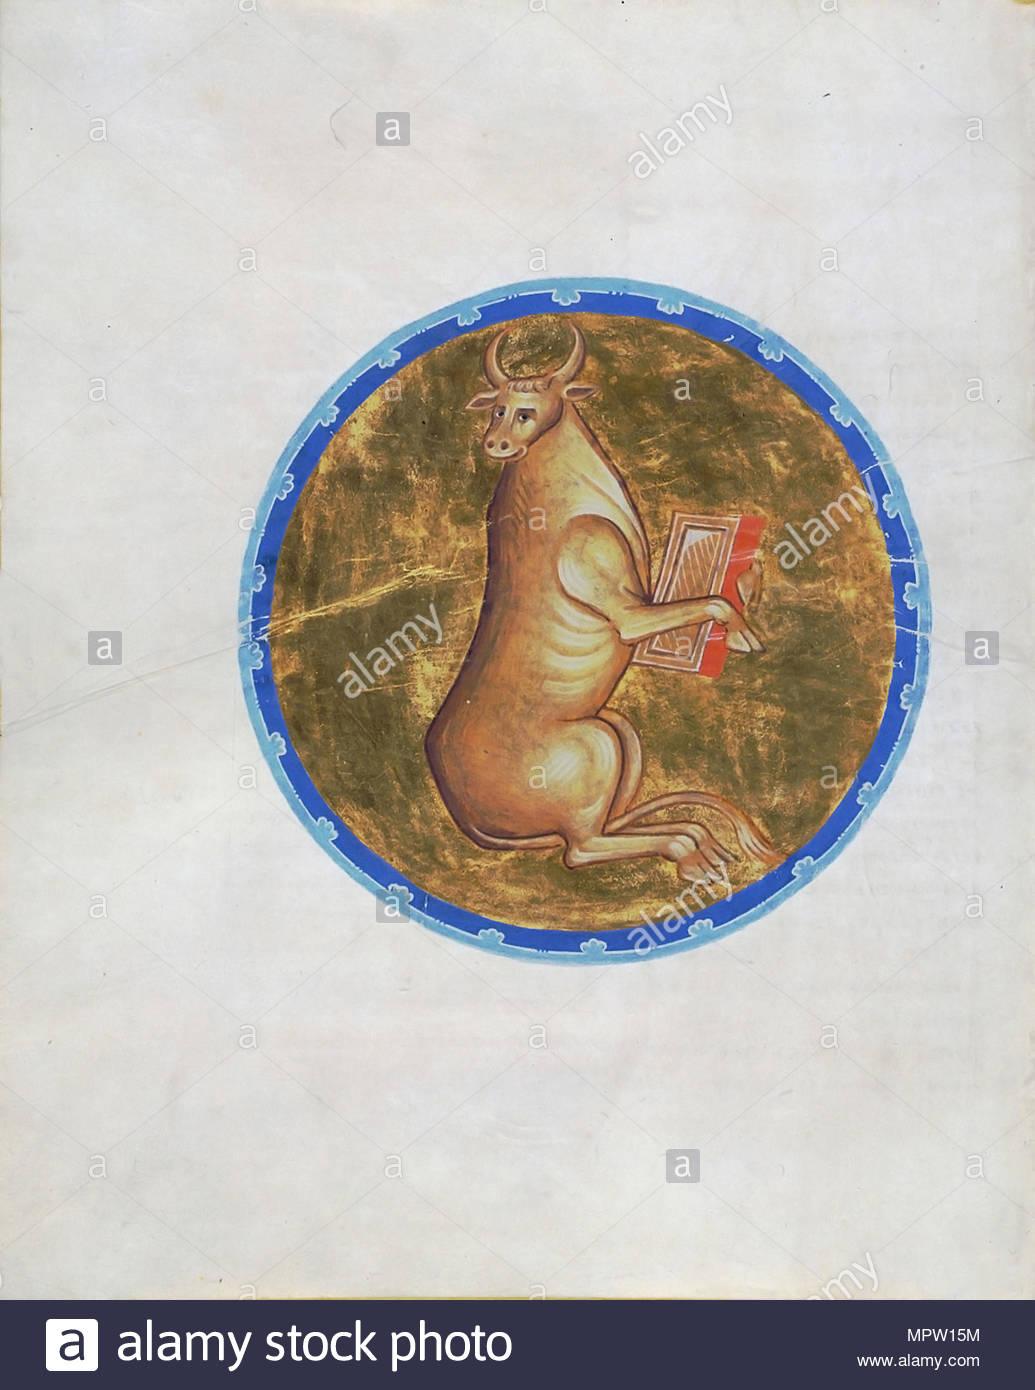 Calf Symbol Of Luke The Evangelist From The Morozov Gospel From